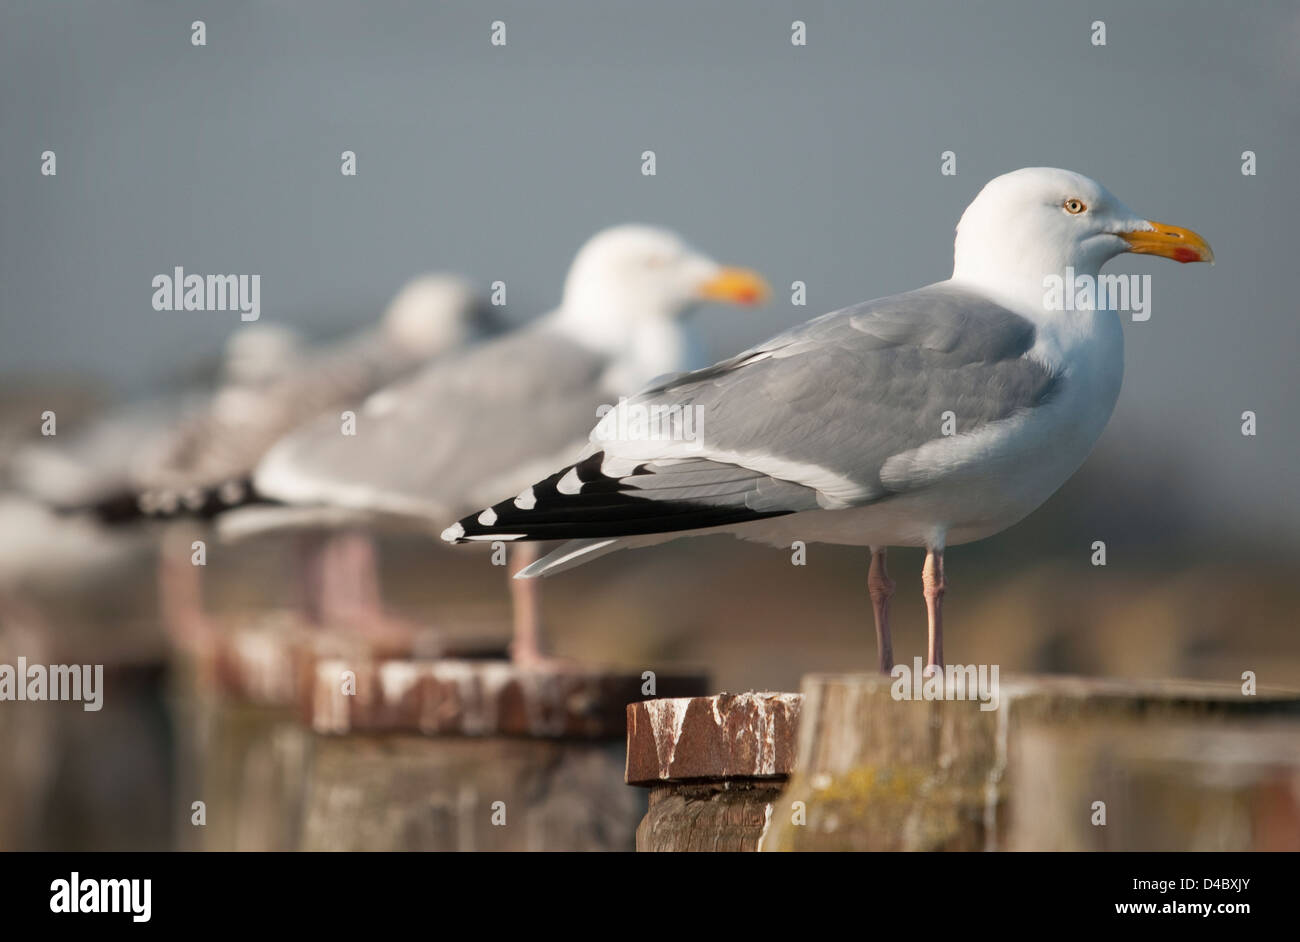 Row of Herring Gulls on Posts - Stock Image